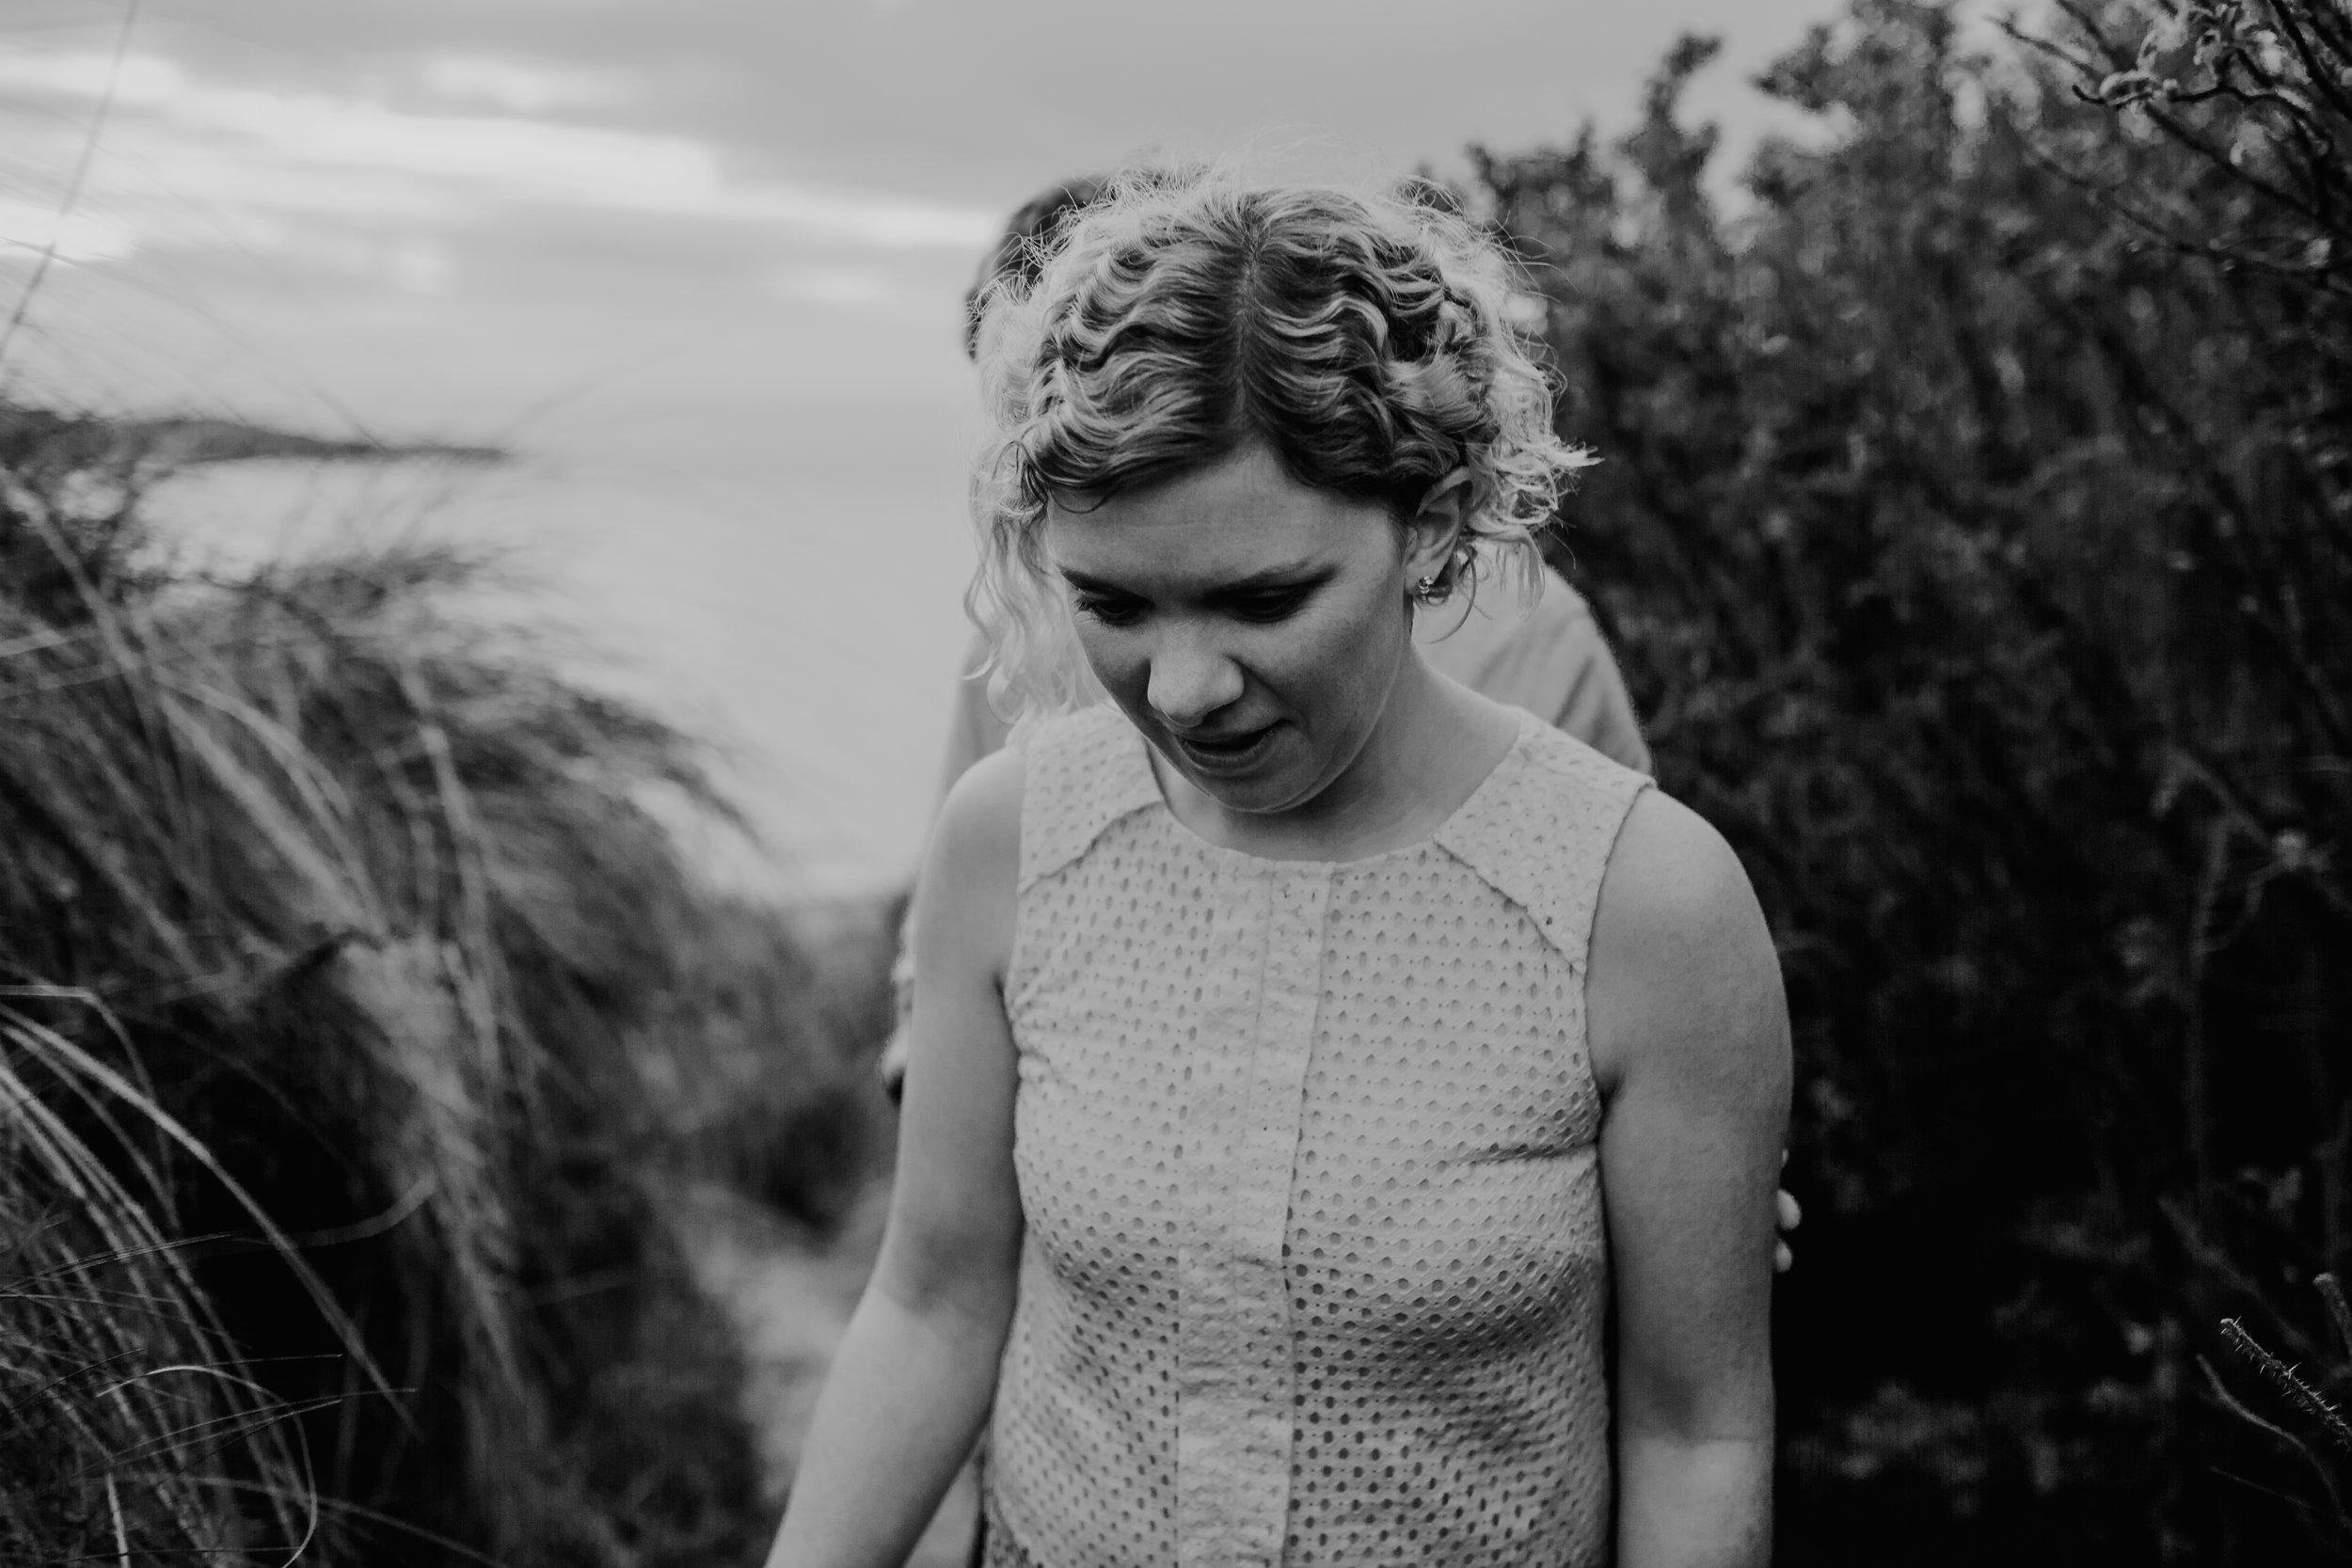 ballycastle-beach-engagement-photographer-northern-ireland